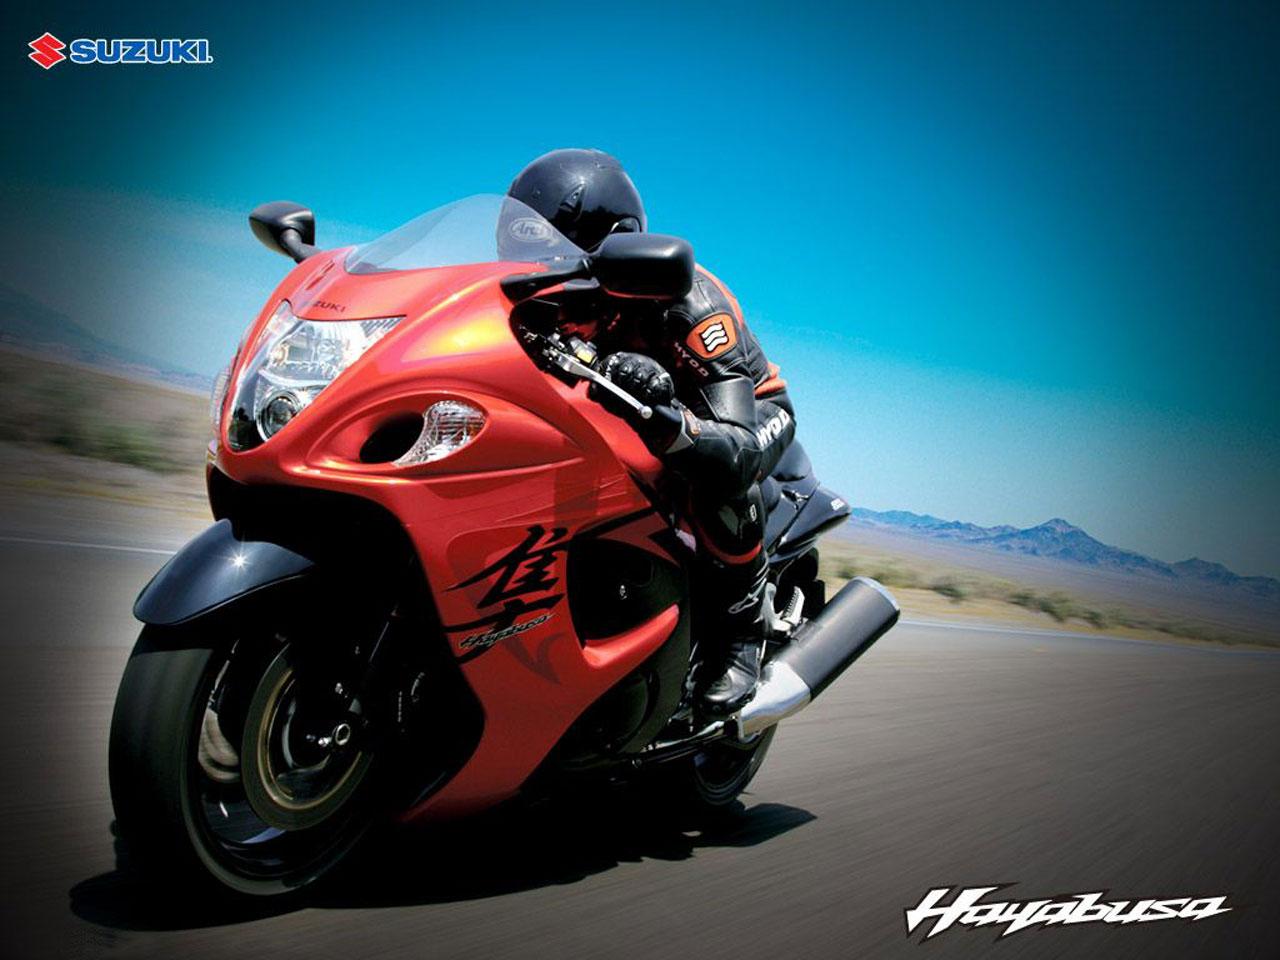 http://2.bp.blogspot.com/-g_DxFJtyw7Q/TYmIAHFuZxI/AAAAAAAAAFY/jT--JRXidvo/s1600/suzuki-red-colour-heavy-bike-wallpaper.jpg